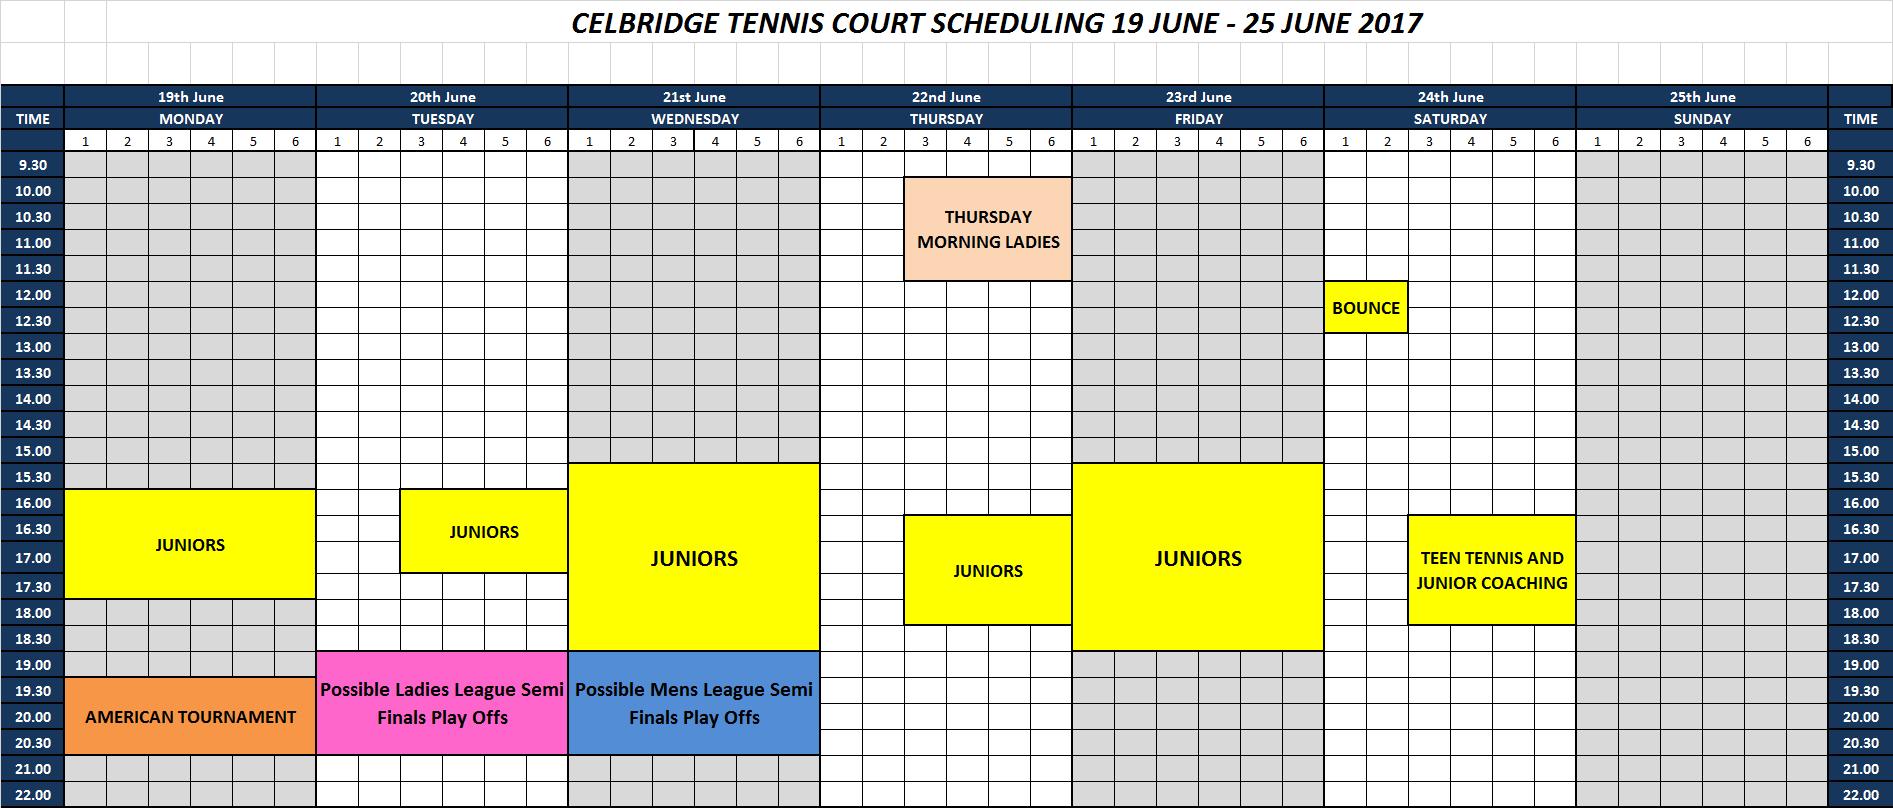 19-25 June